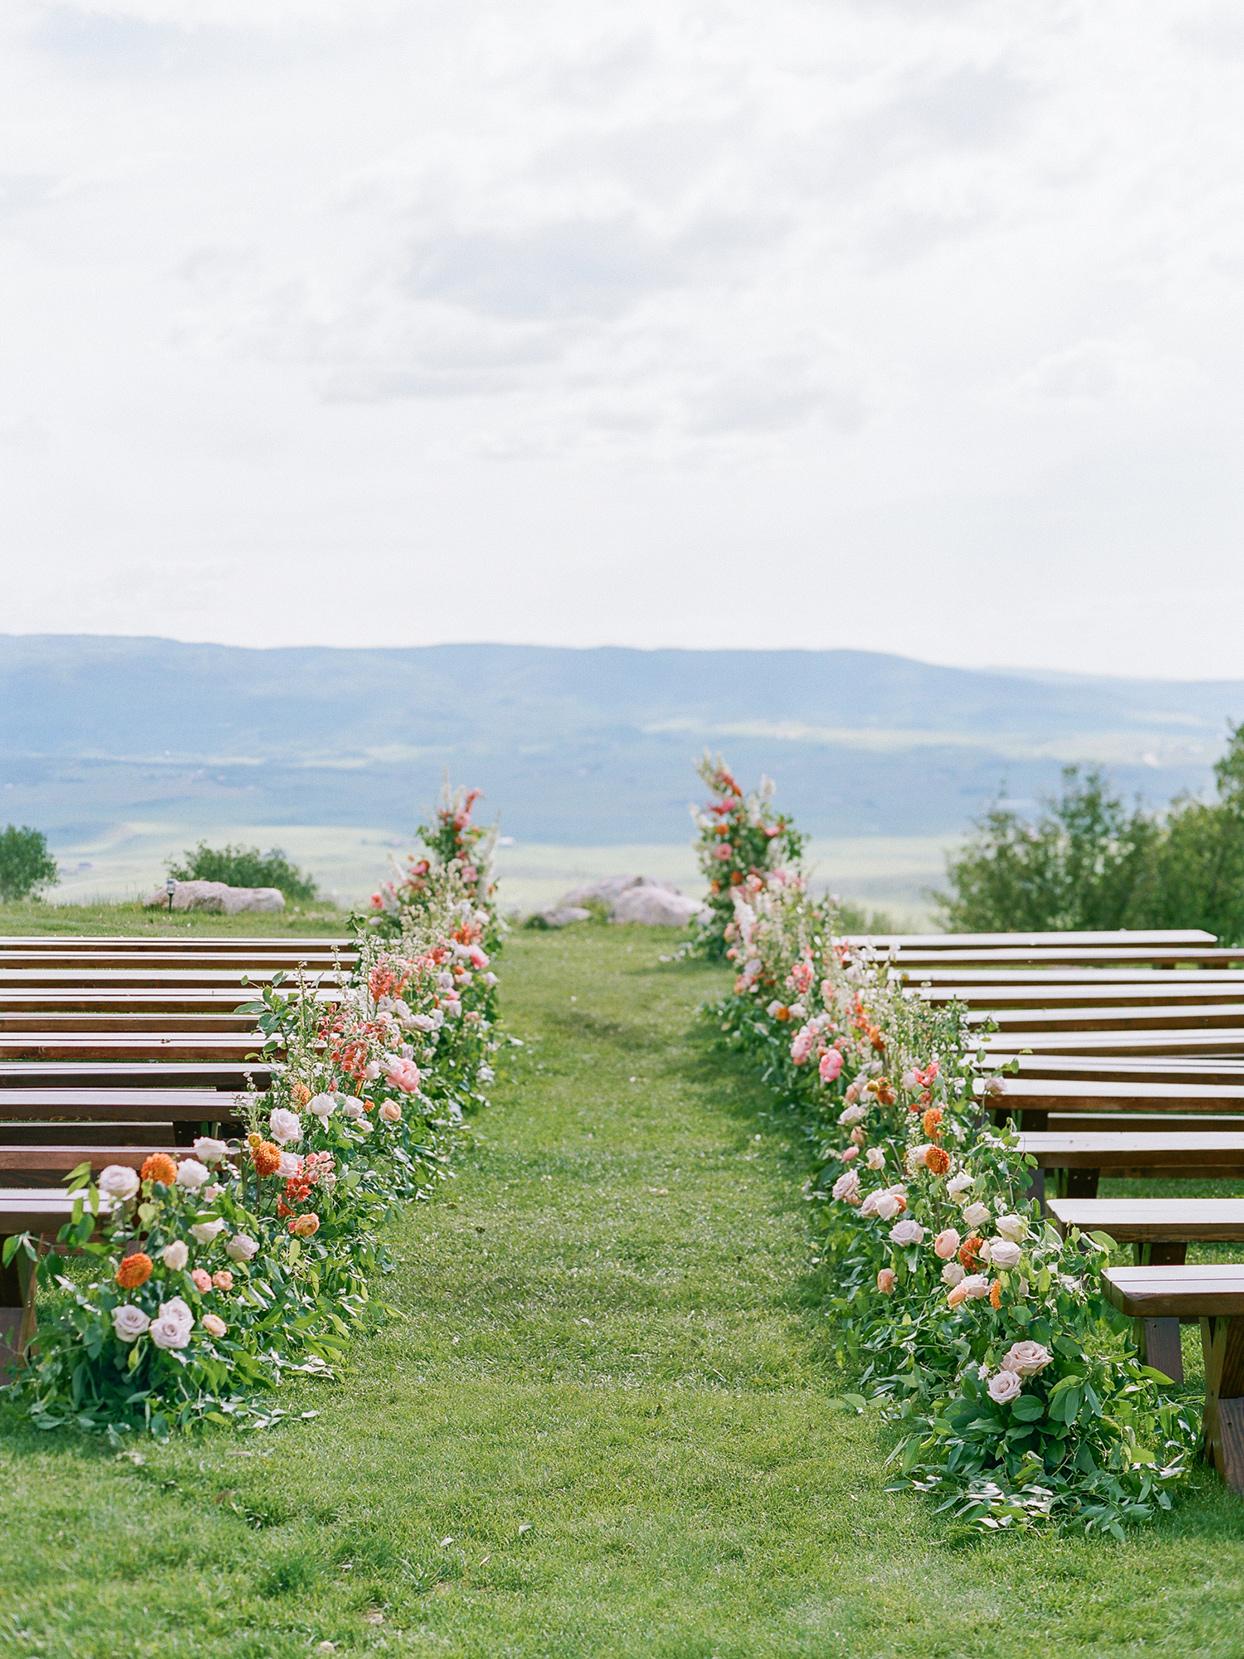 logan conor wedding ceremony location overlooking mountains